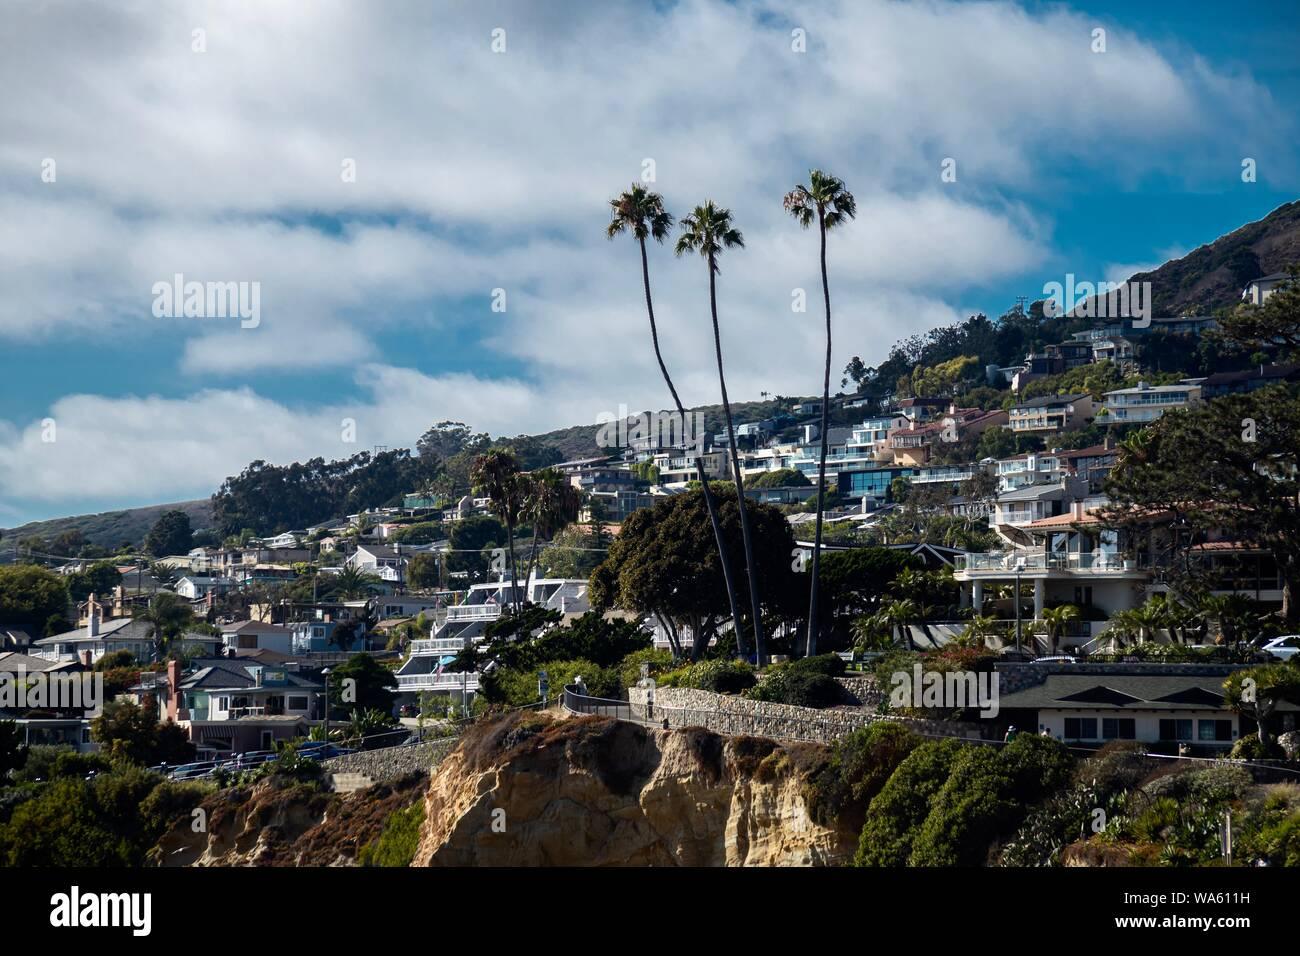 Homes on the hillside overlooking the ocean in Laguna Beach, Orange County, California, USA Stock Photo